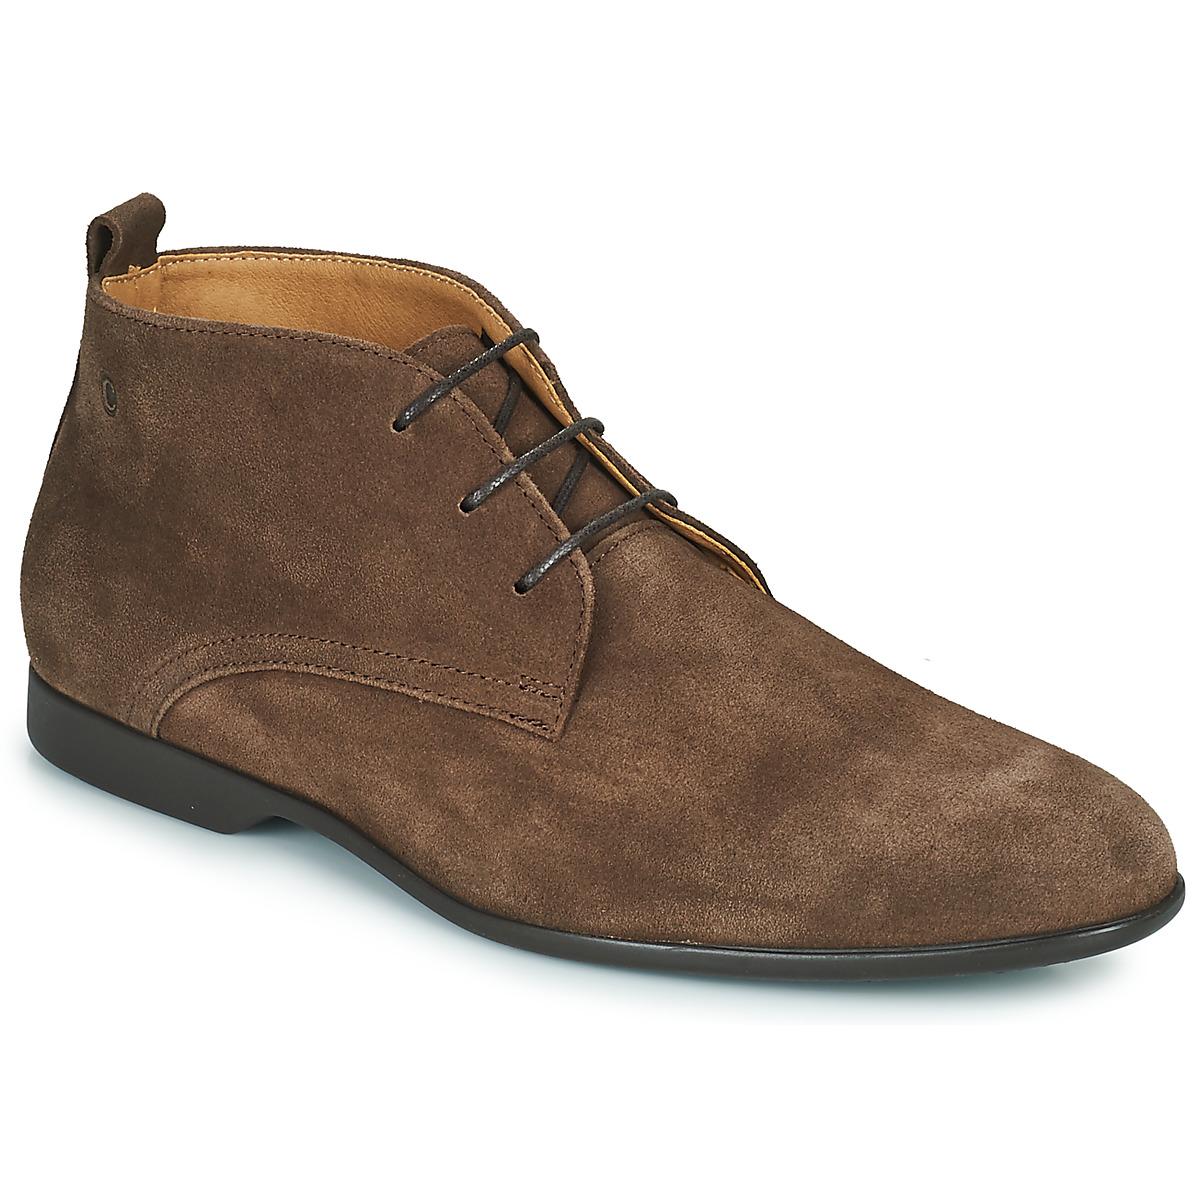 Carlington EONARD Braun - Kostenloser Versand bei Spartoode ! - Schuhe Boots Herren 51,99 €